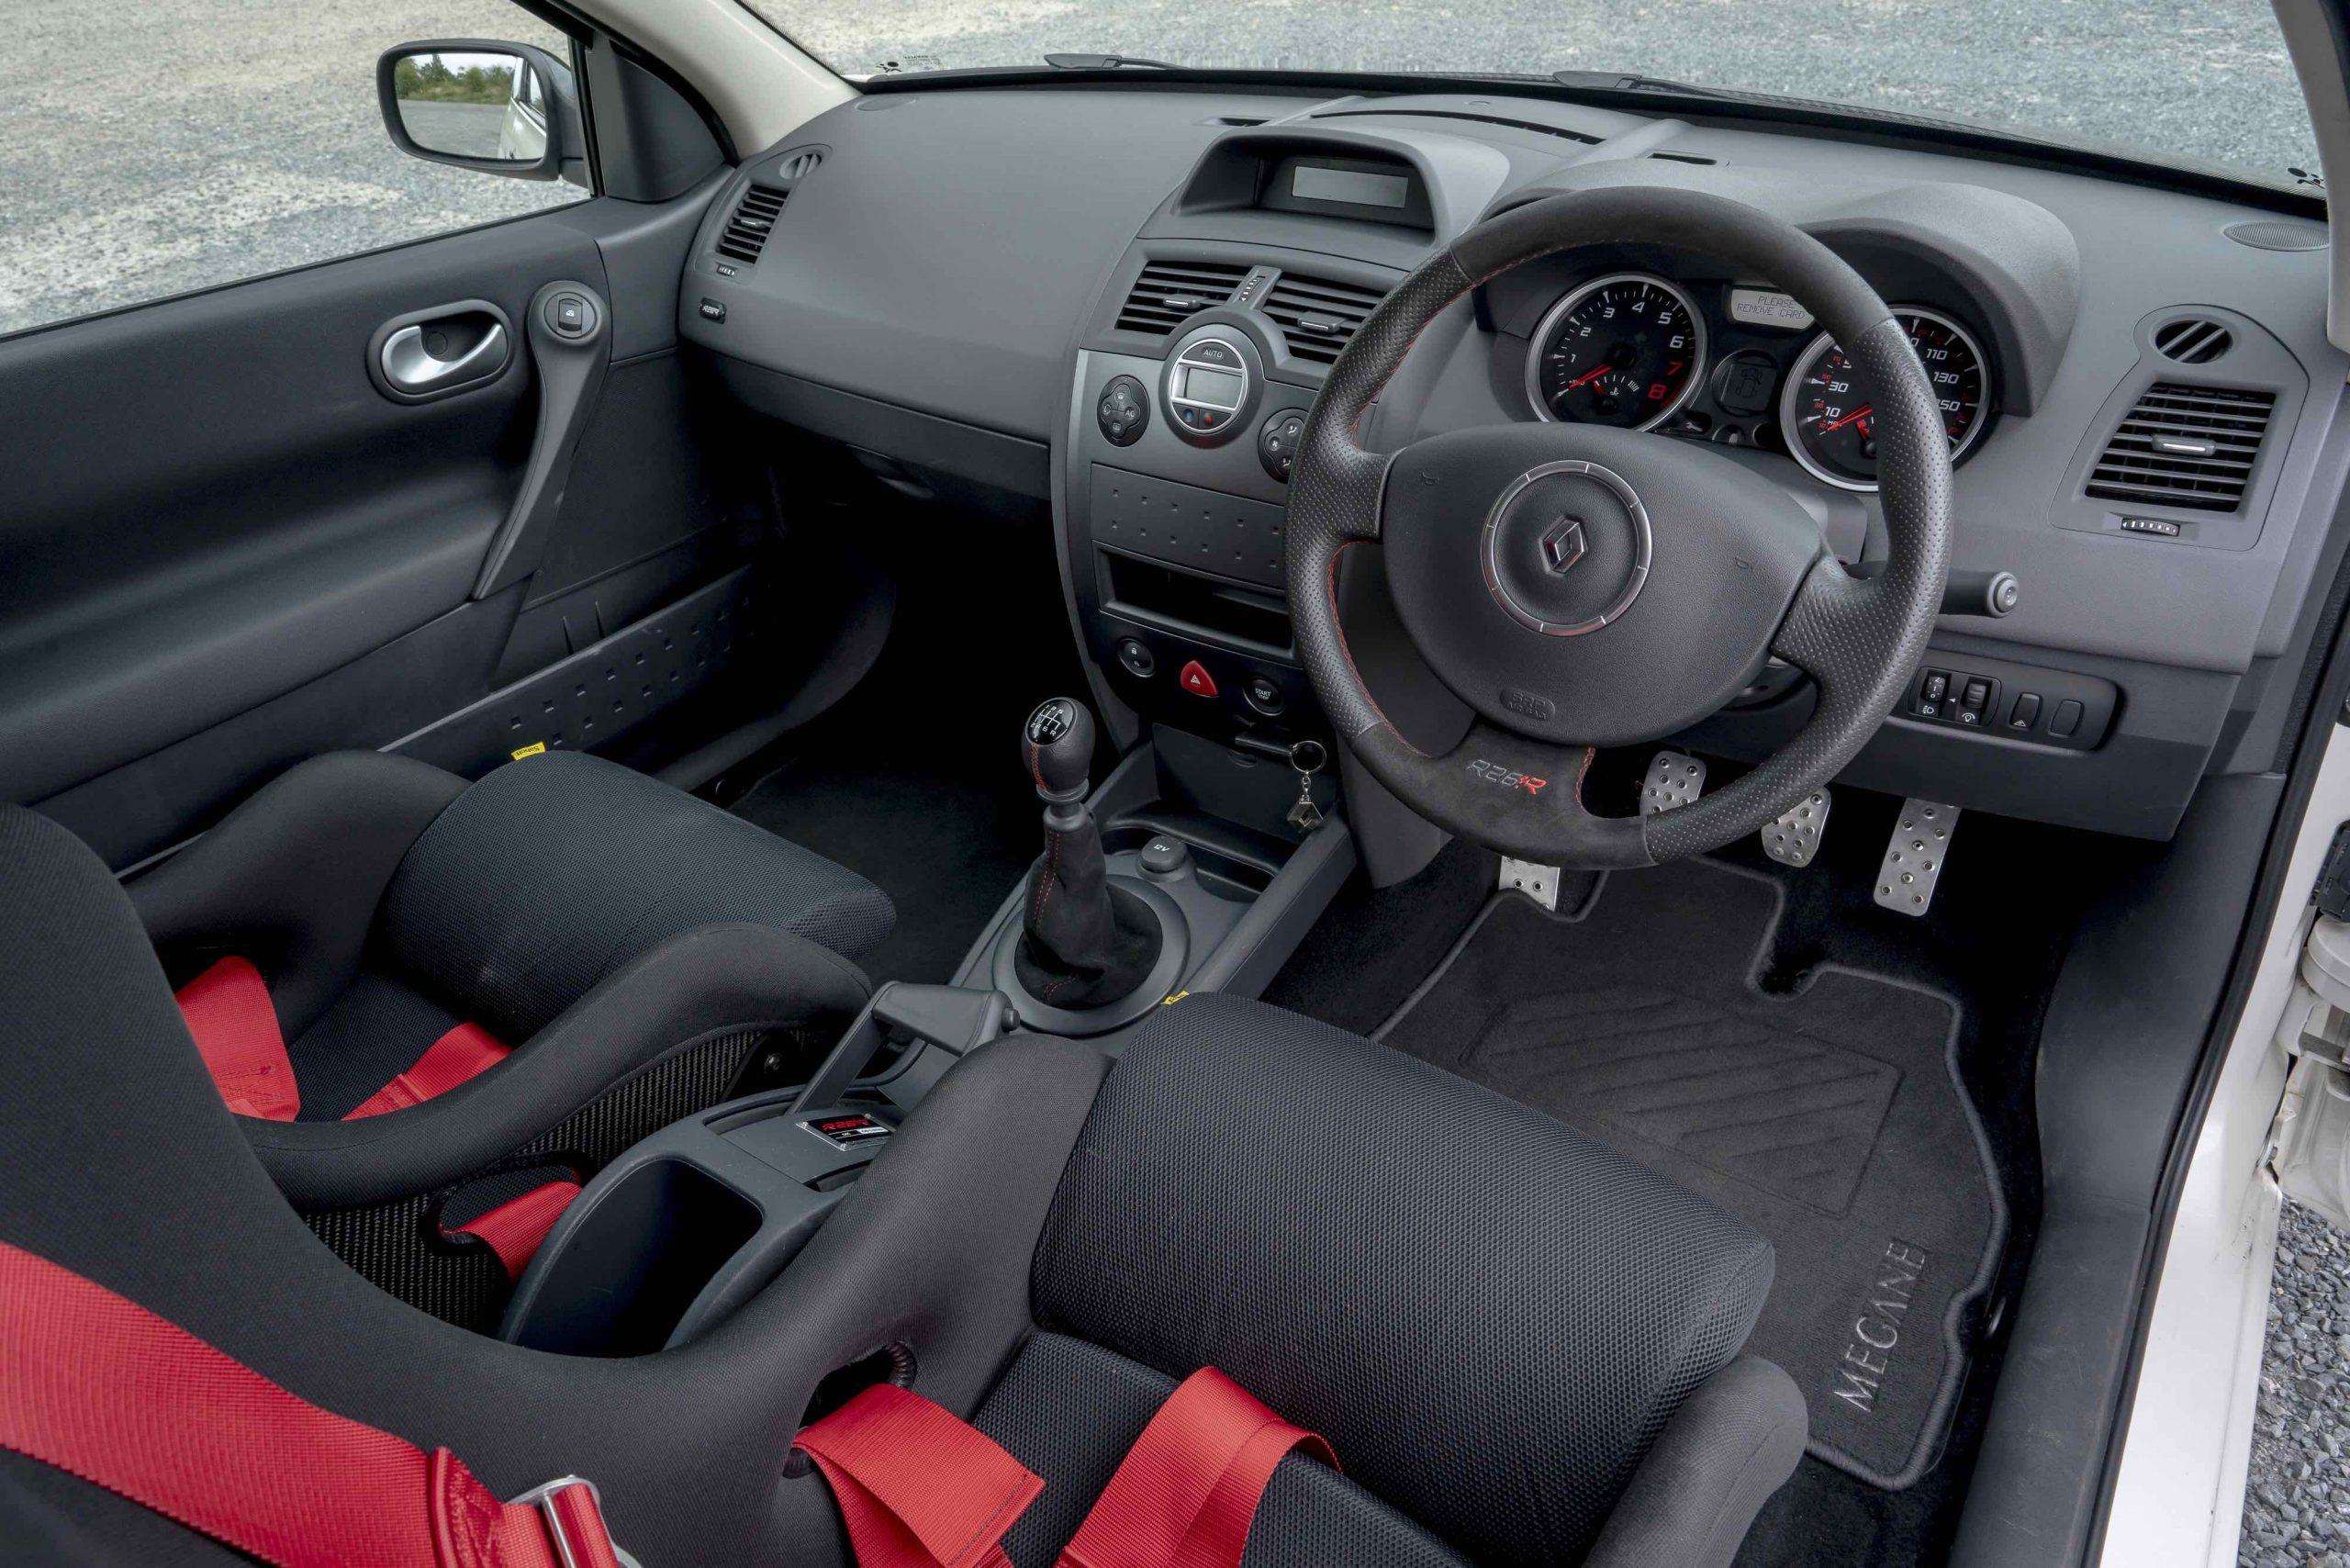 Renault Megane R26R interior drivers cockpit